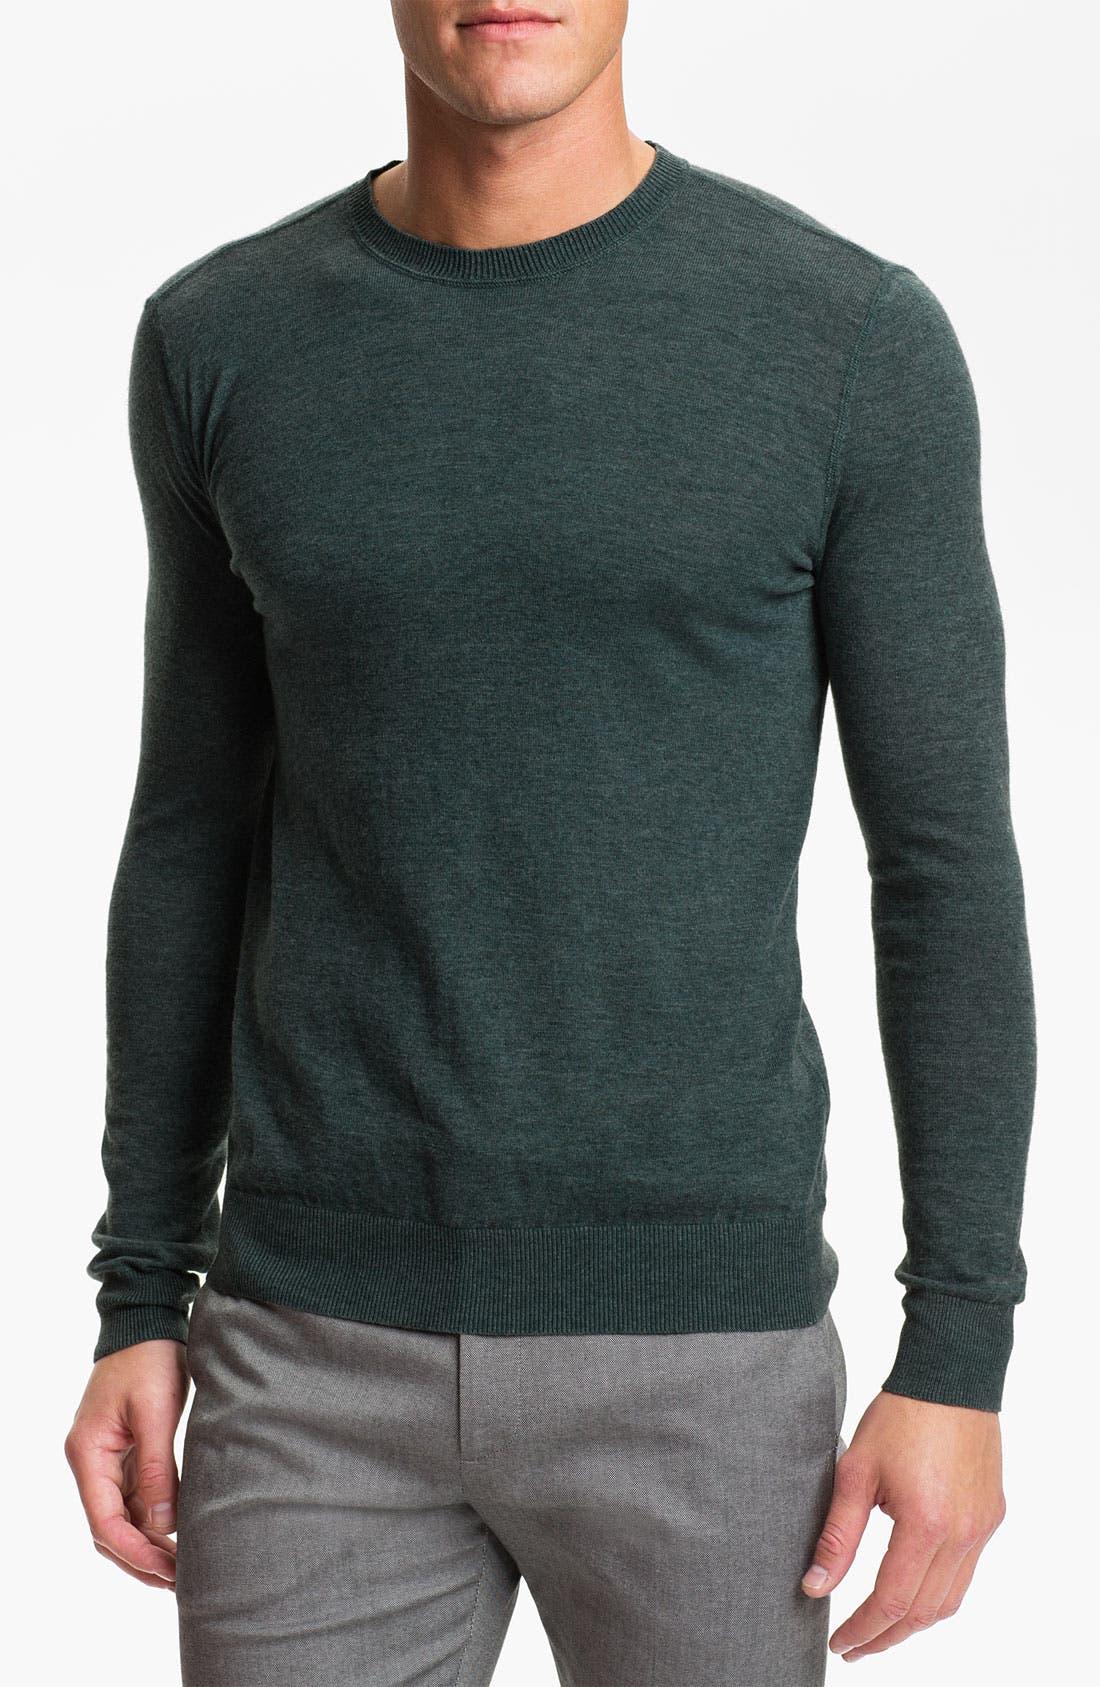 Main Image - Theory 'Riland' Stonewash Crewneck Sweater